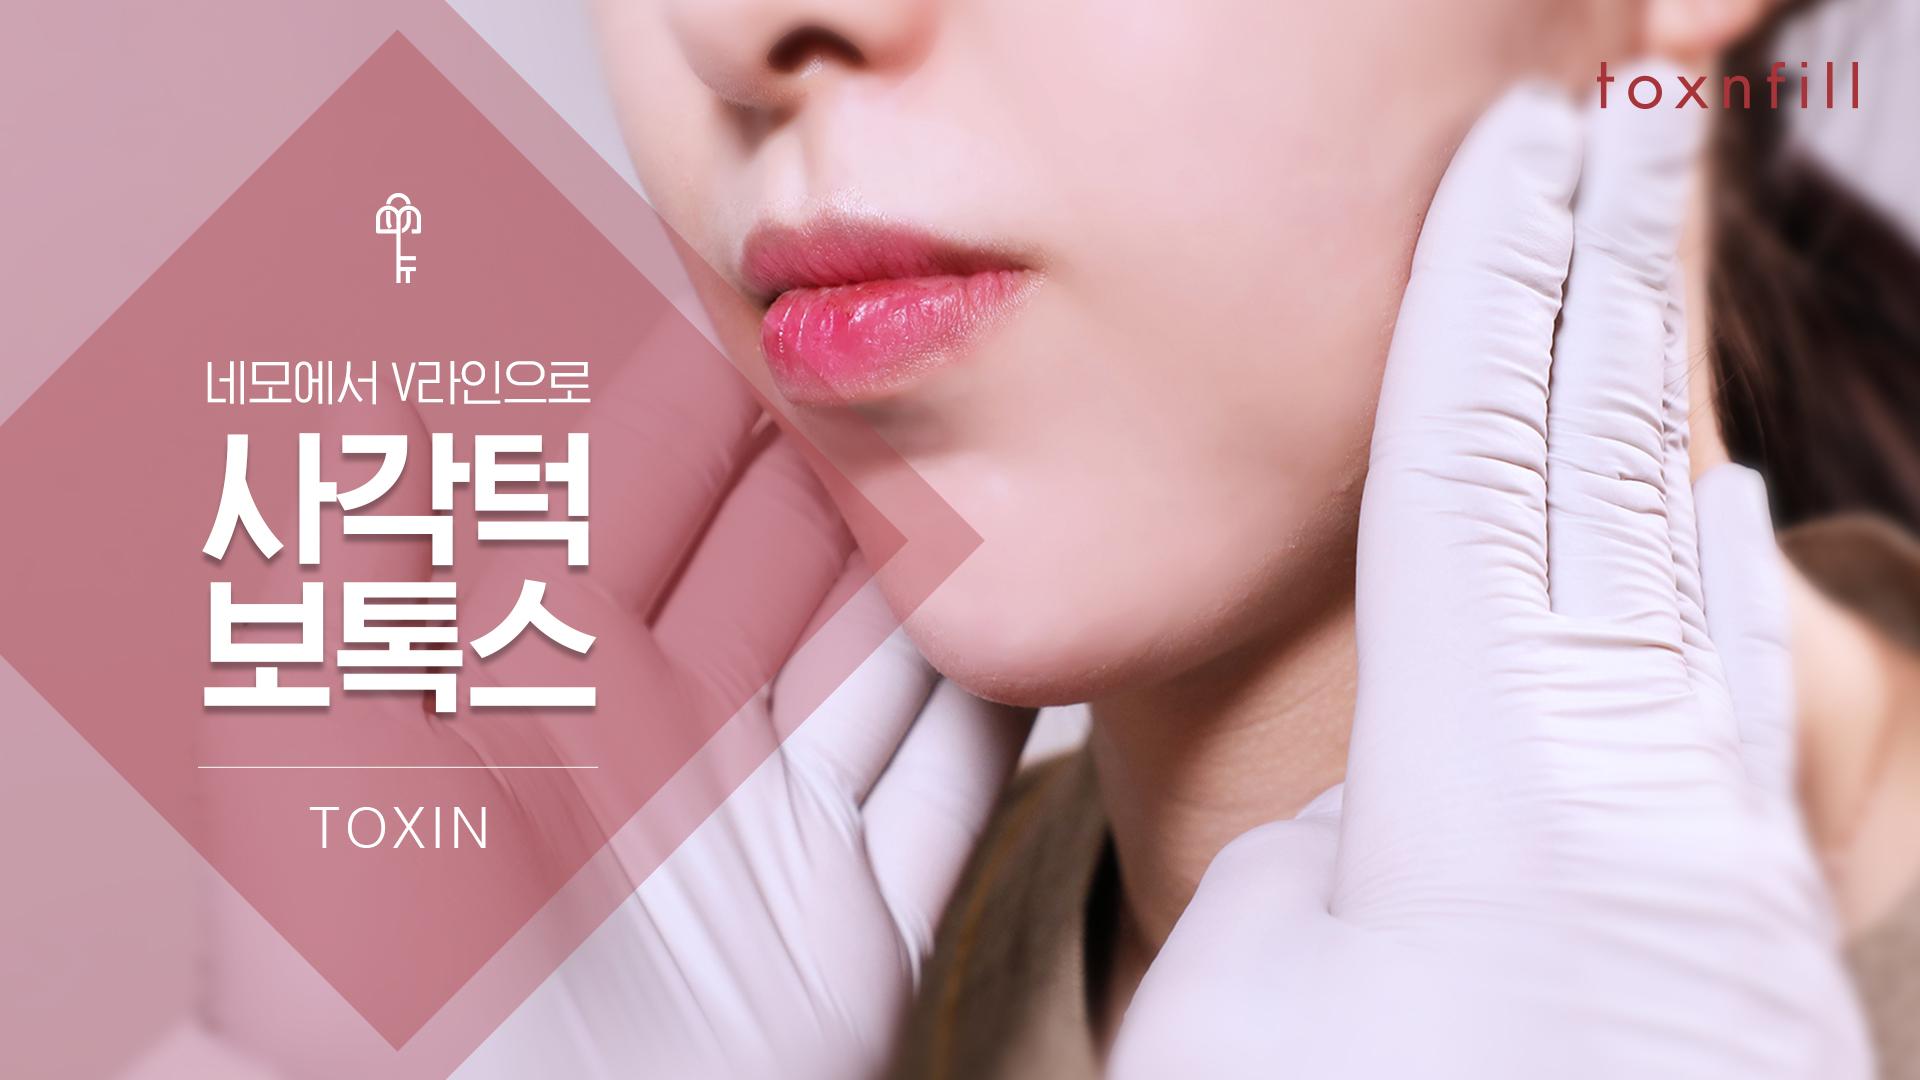 [EVENT] 갸름한 턱라인 사각턱톡신(제오민)